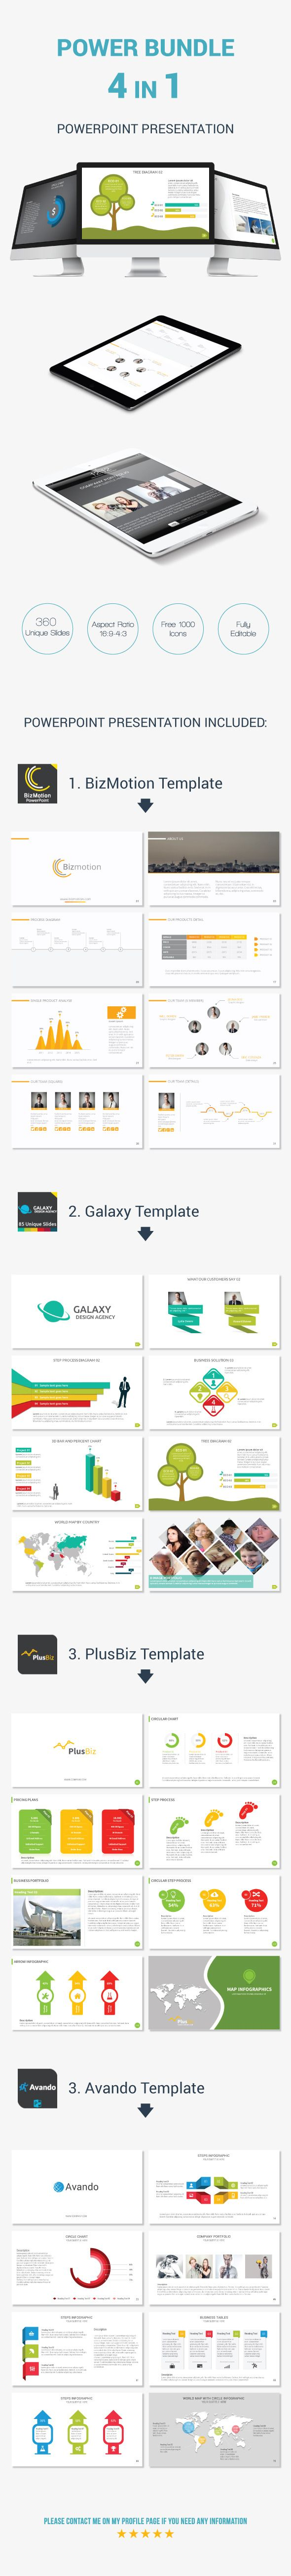 Power Bundle PowerPoint Presentation Template #design #slides Download: http://graphicriver.net/item/power-bundle-powerpoint-presentation-template/13210309?ref=ksioks